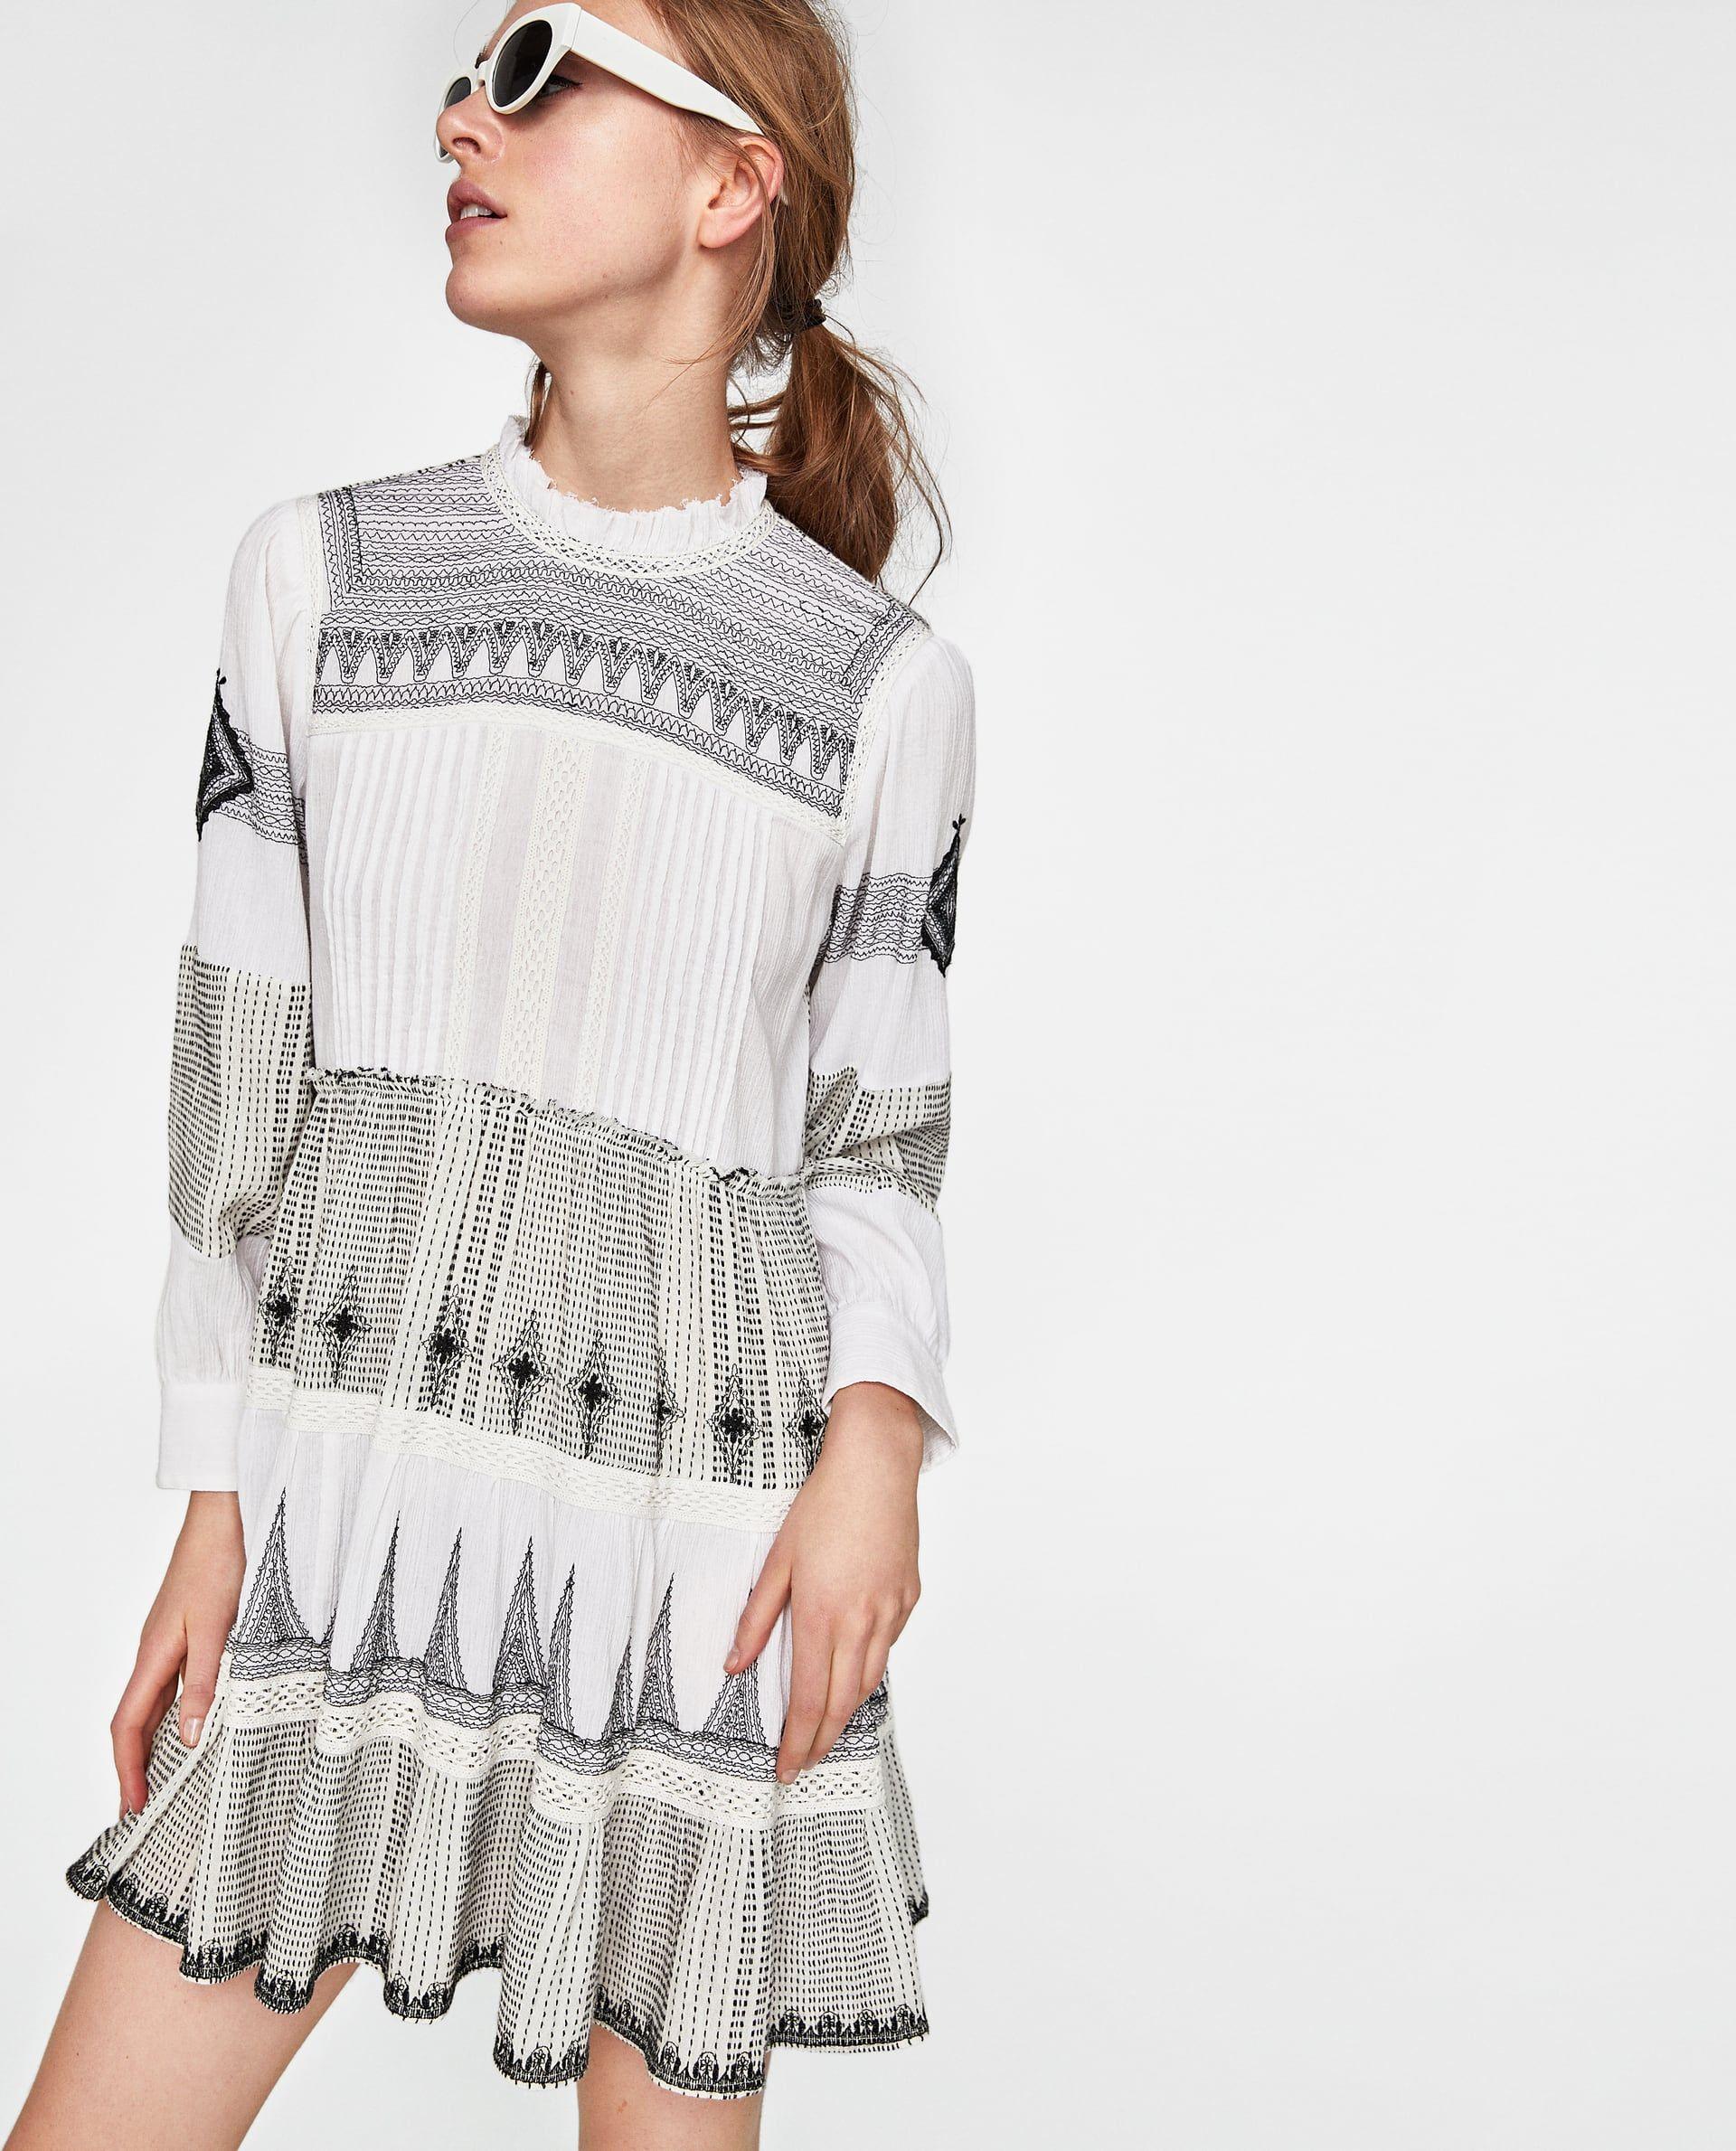 53daa347b43a MINI DRESS WITH CONTRASTING EMBROIDERY Zara Mini, Mini Robes, Zara United  States, Fringe